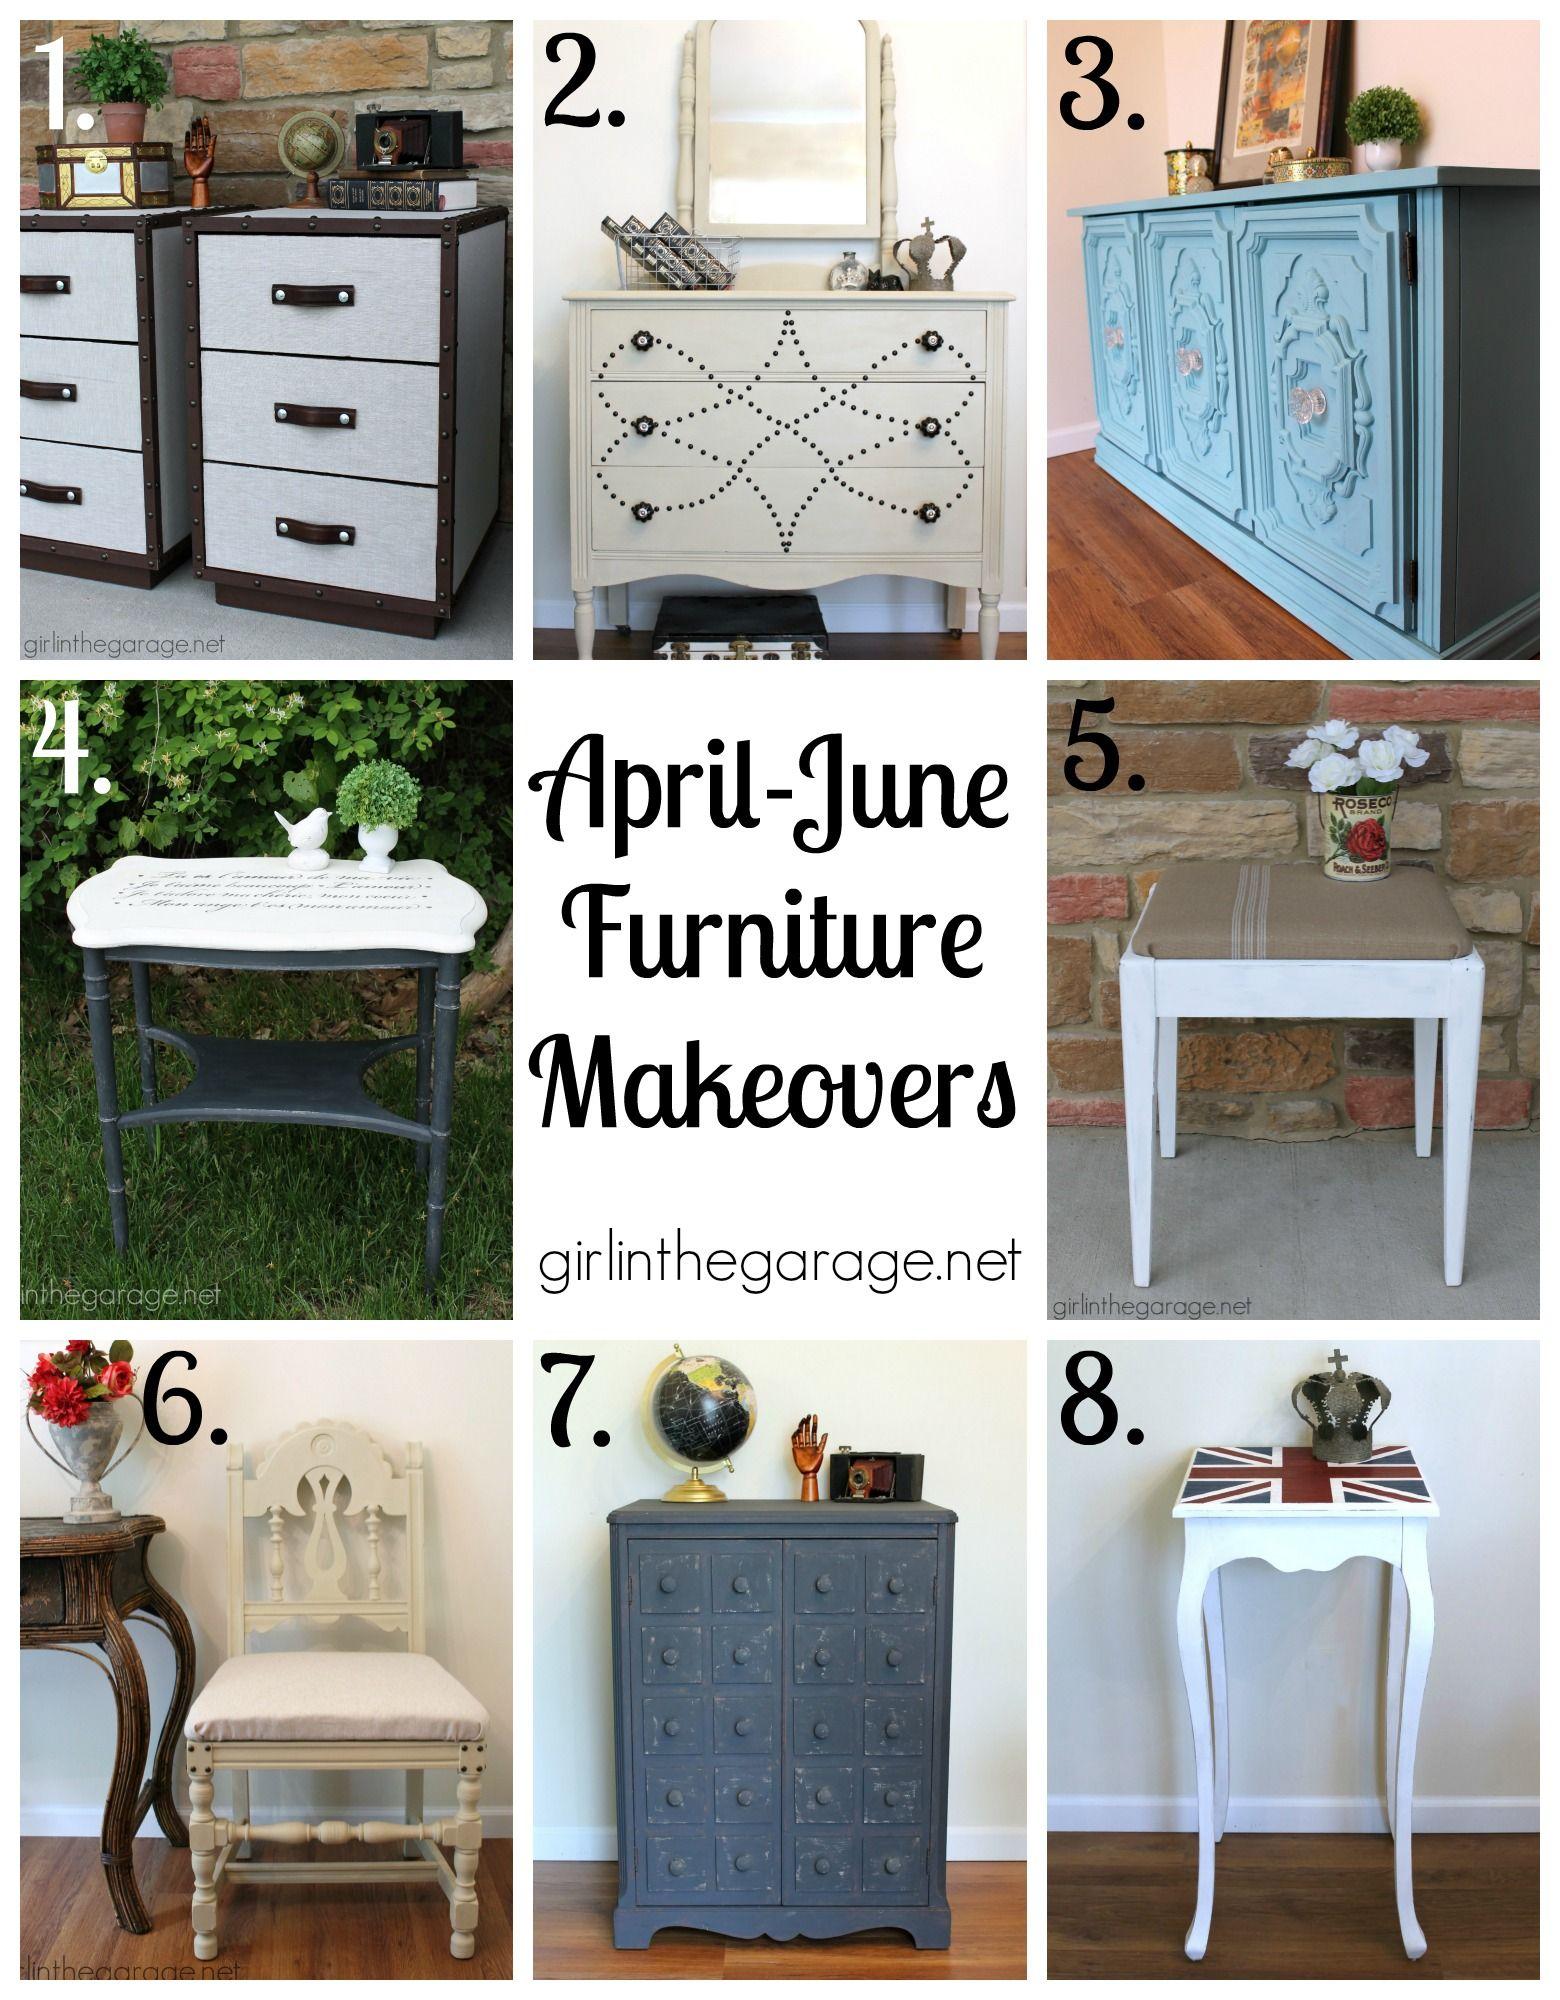 The best furniture makeovers, DIY, and decor posts for April-June 2015. girlinthegarage.net